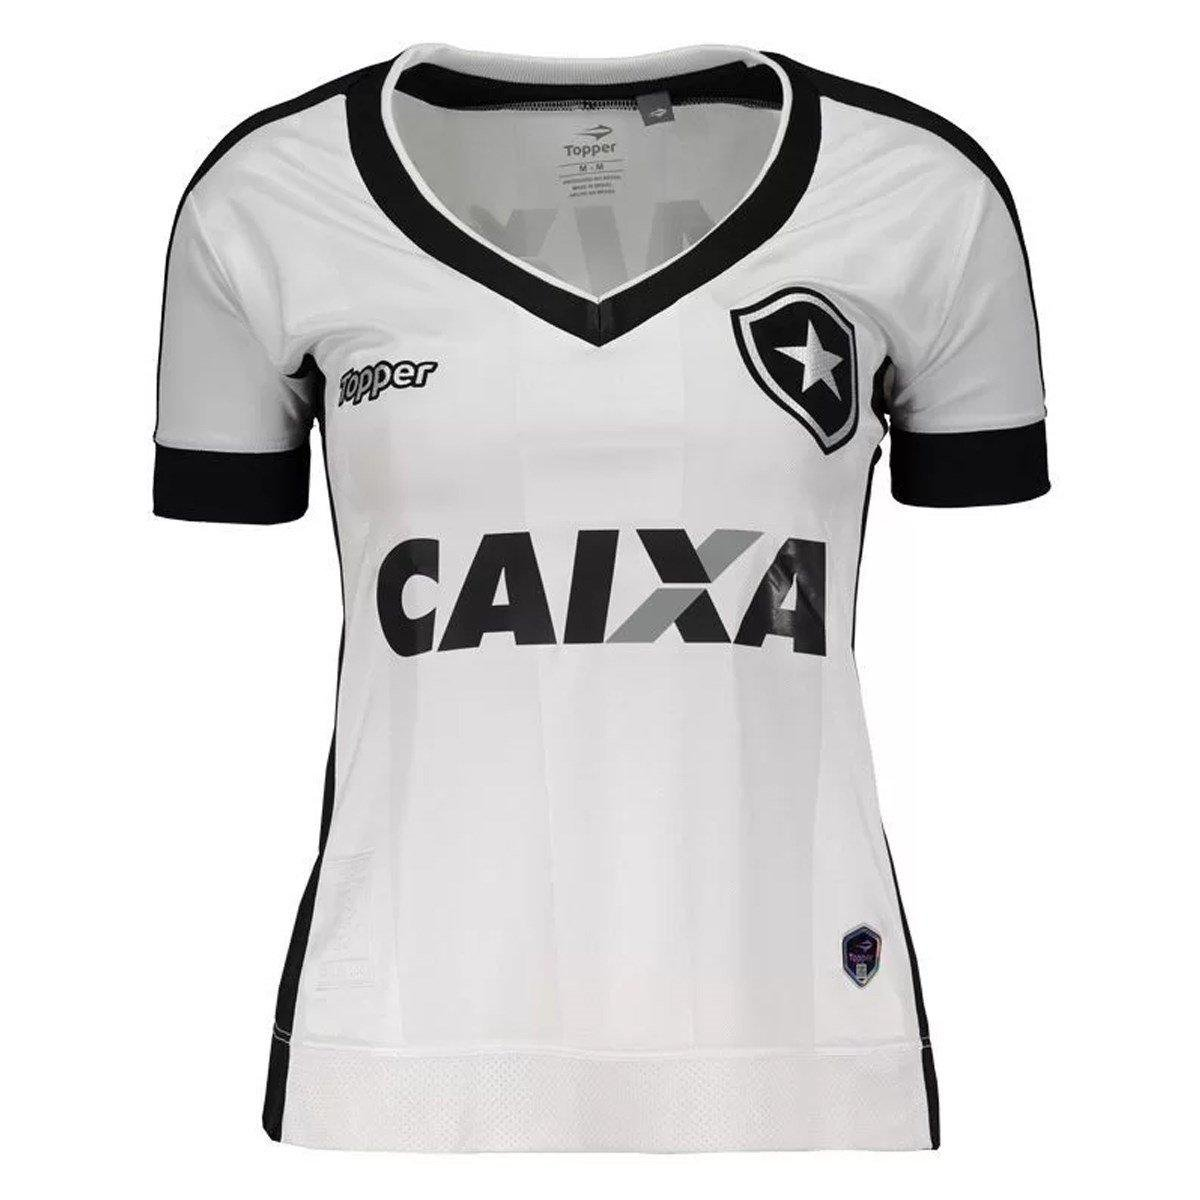 9616acaf61 Camisa Topper Botafogo III 2017 Feminina - Compre Agora